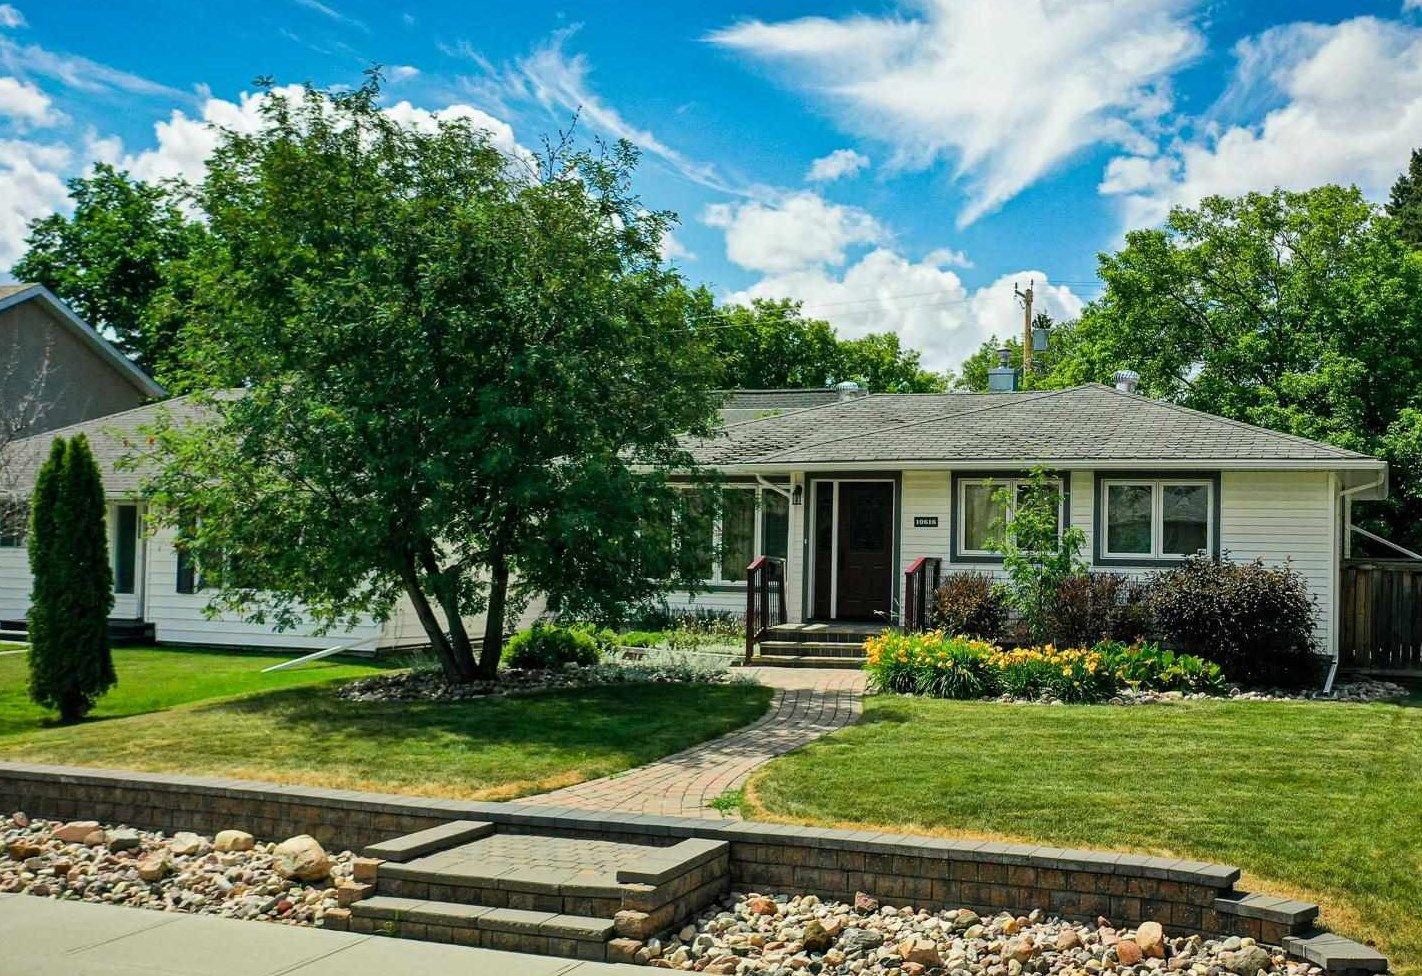 Main Photo: 10616 137 Street in Edmonton: Zone 11 House for sale : MLS®# E4253131